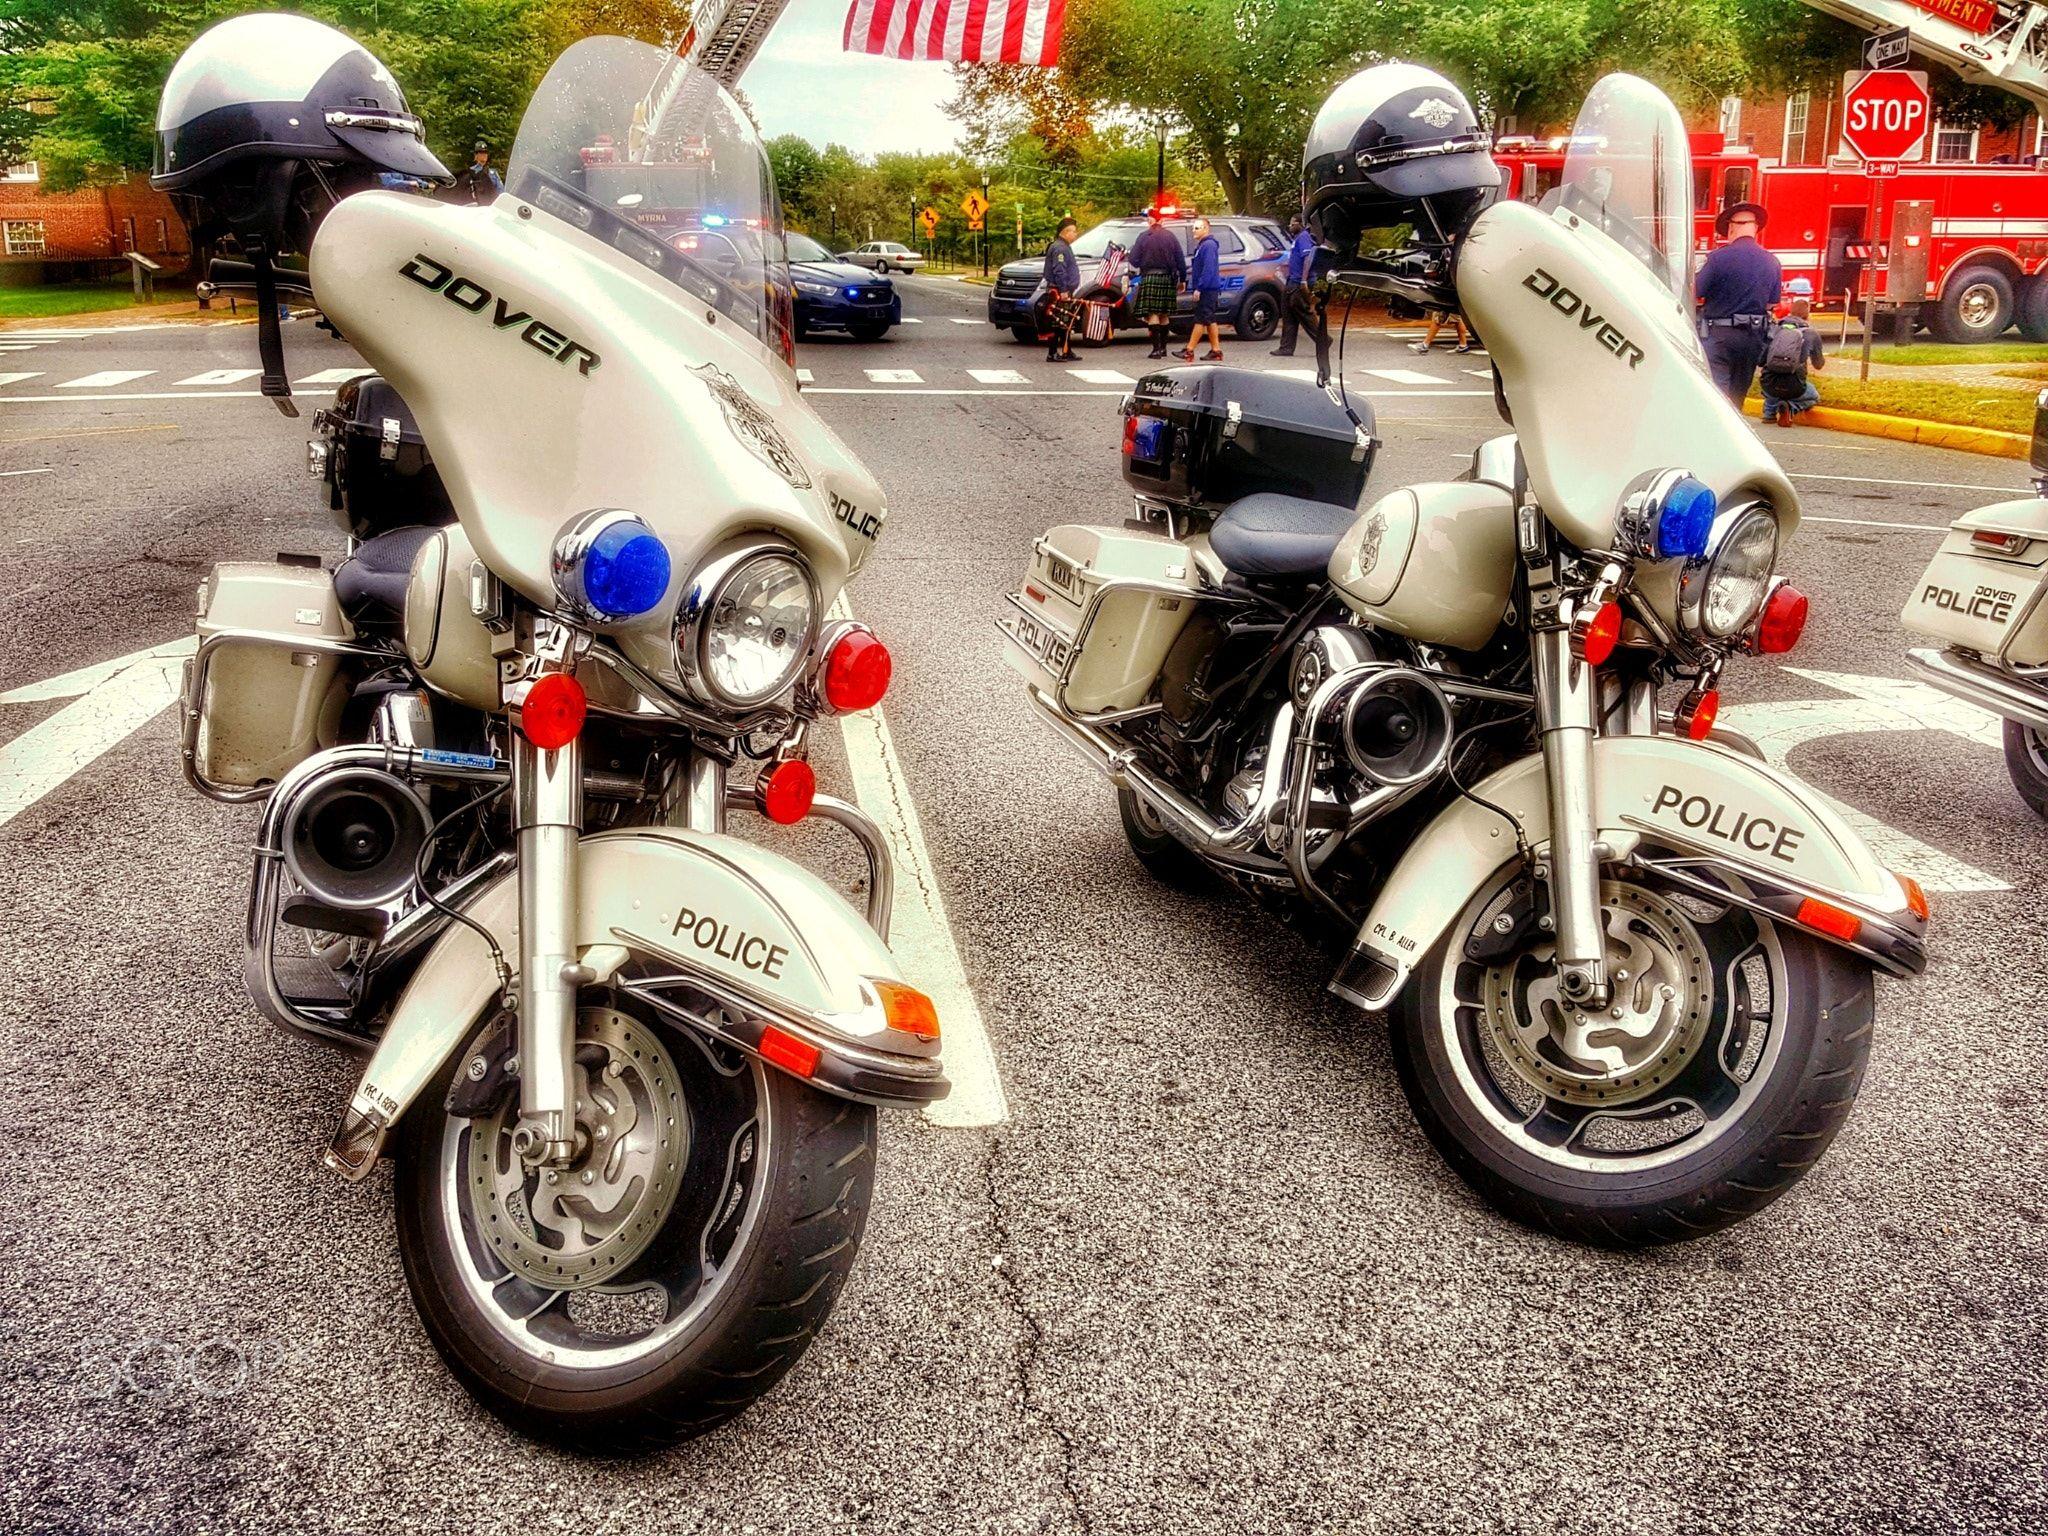 Illinois bureau county dover - Police Motorcycles Dover Police Department Motorcycle Units From The Dover Pd Kent County